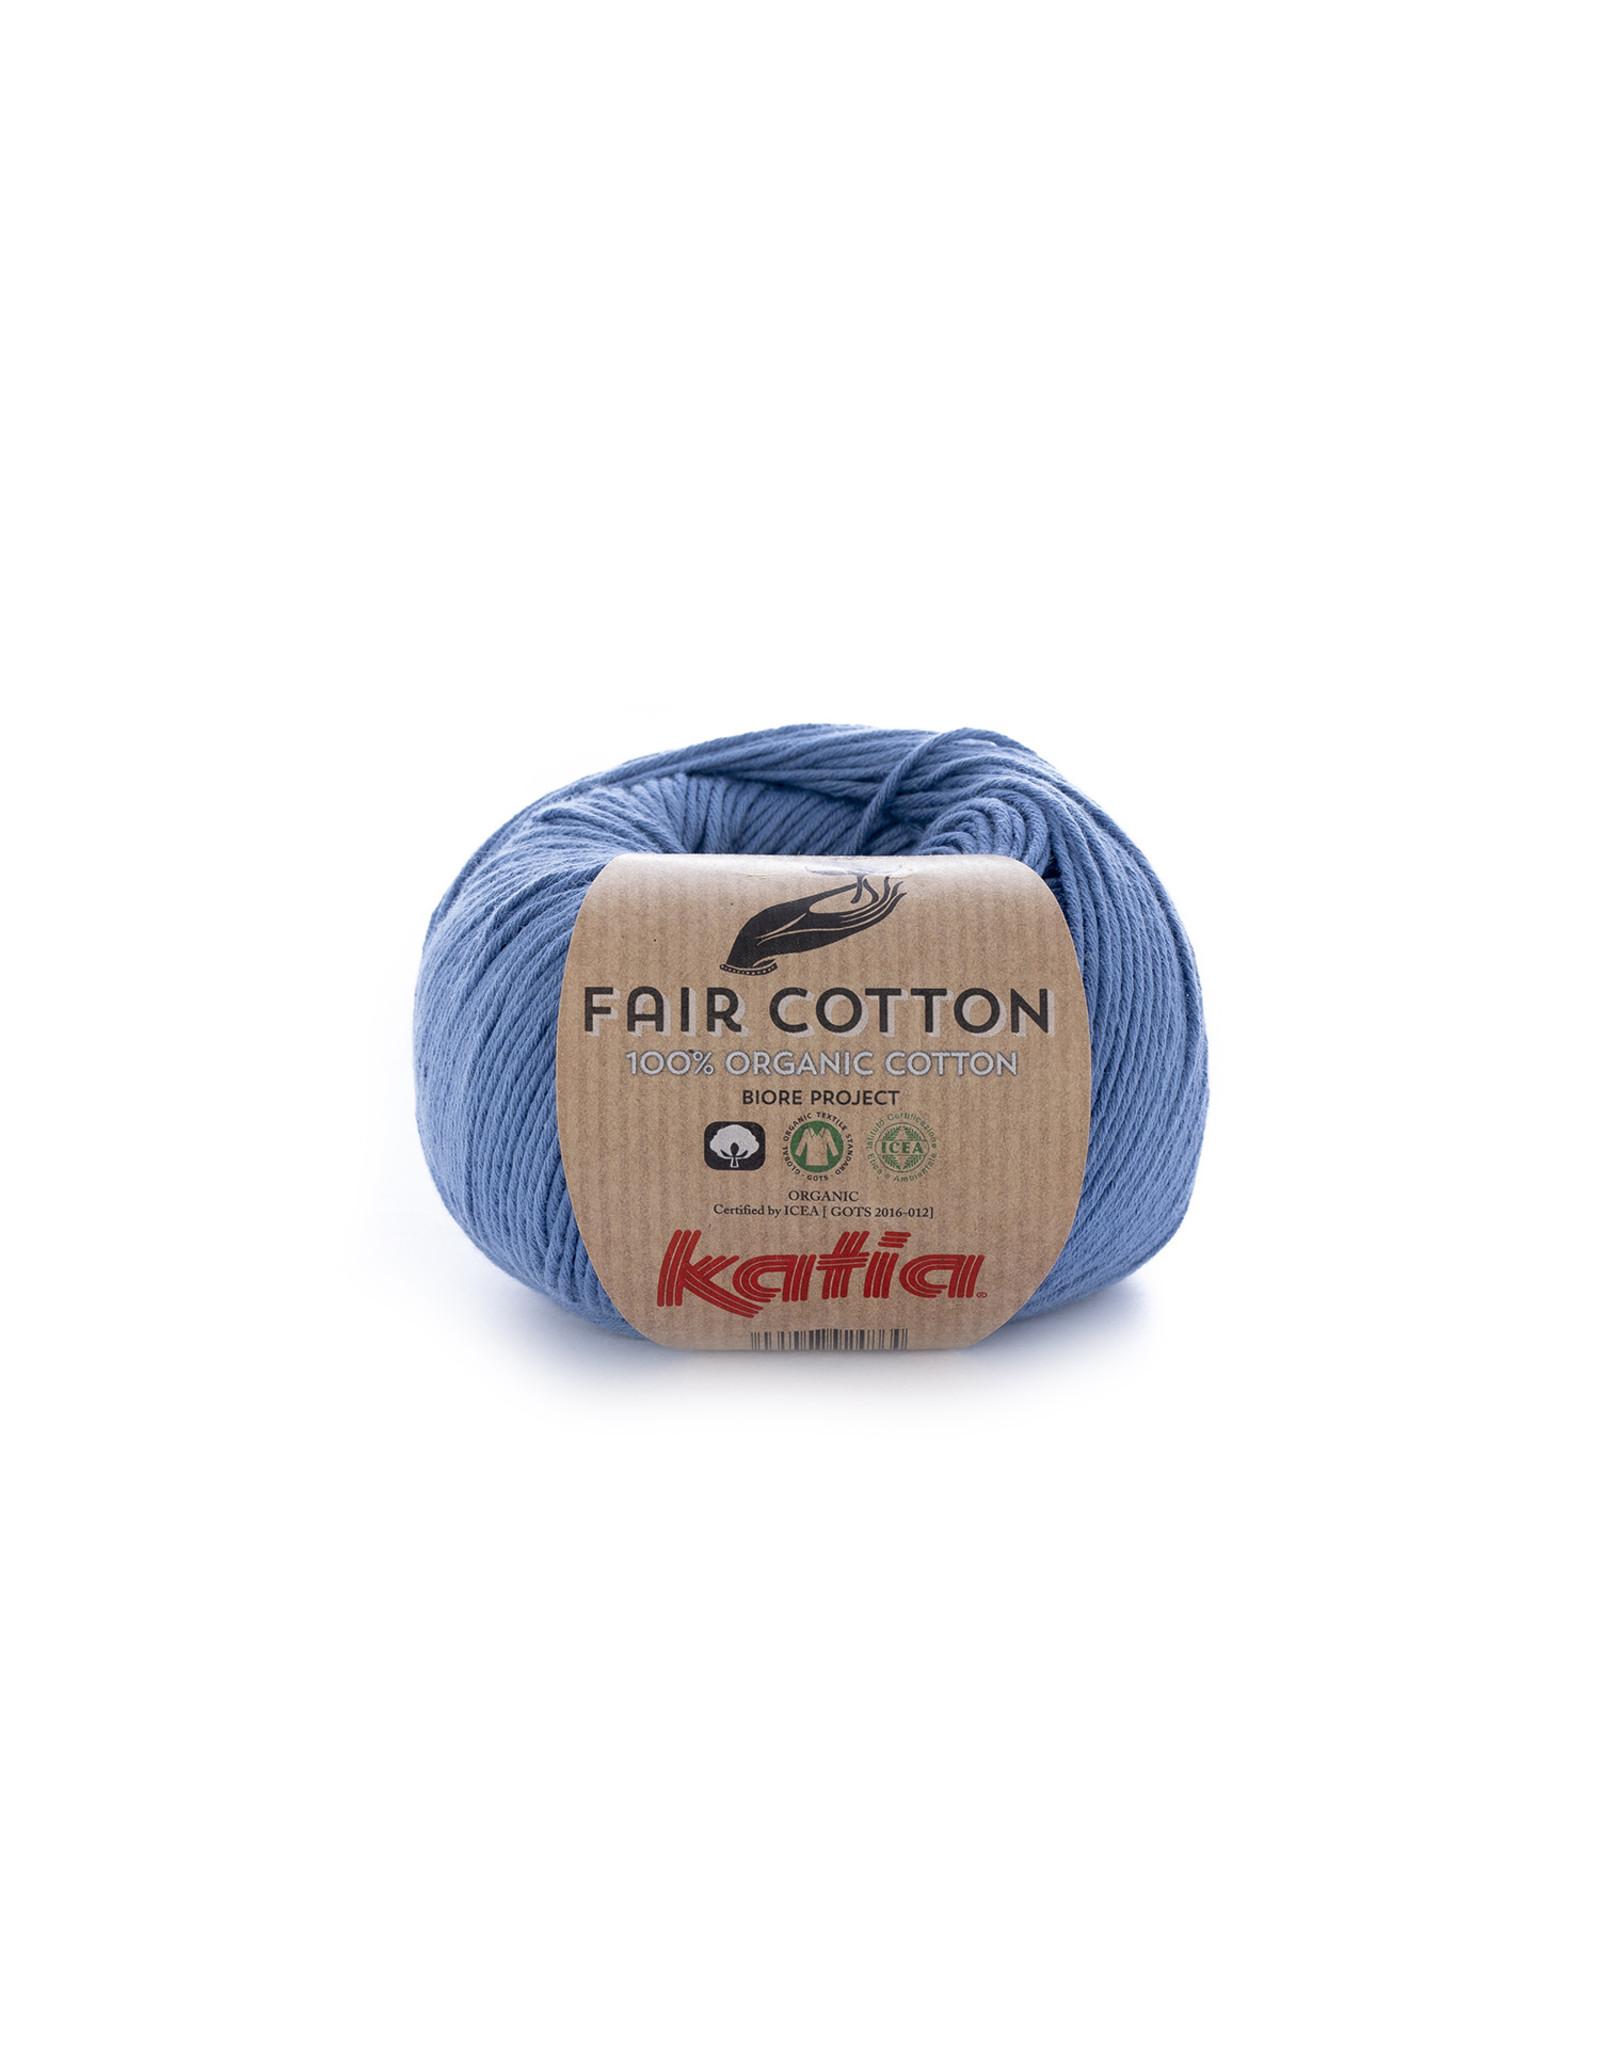 Katia Katia Fair Cotton 18 - jeans - 50 gr. - 100% biol. katoen